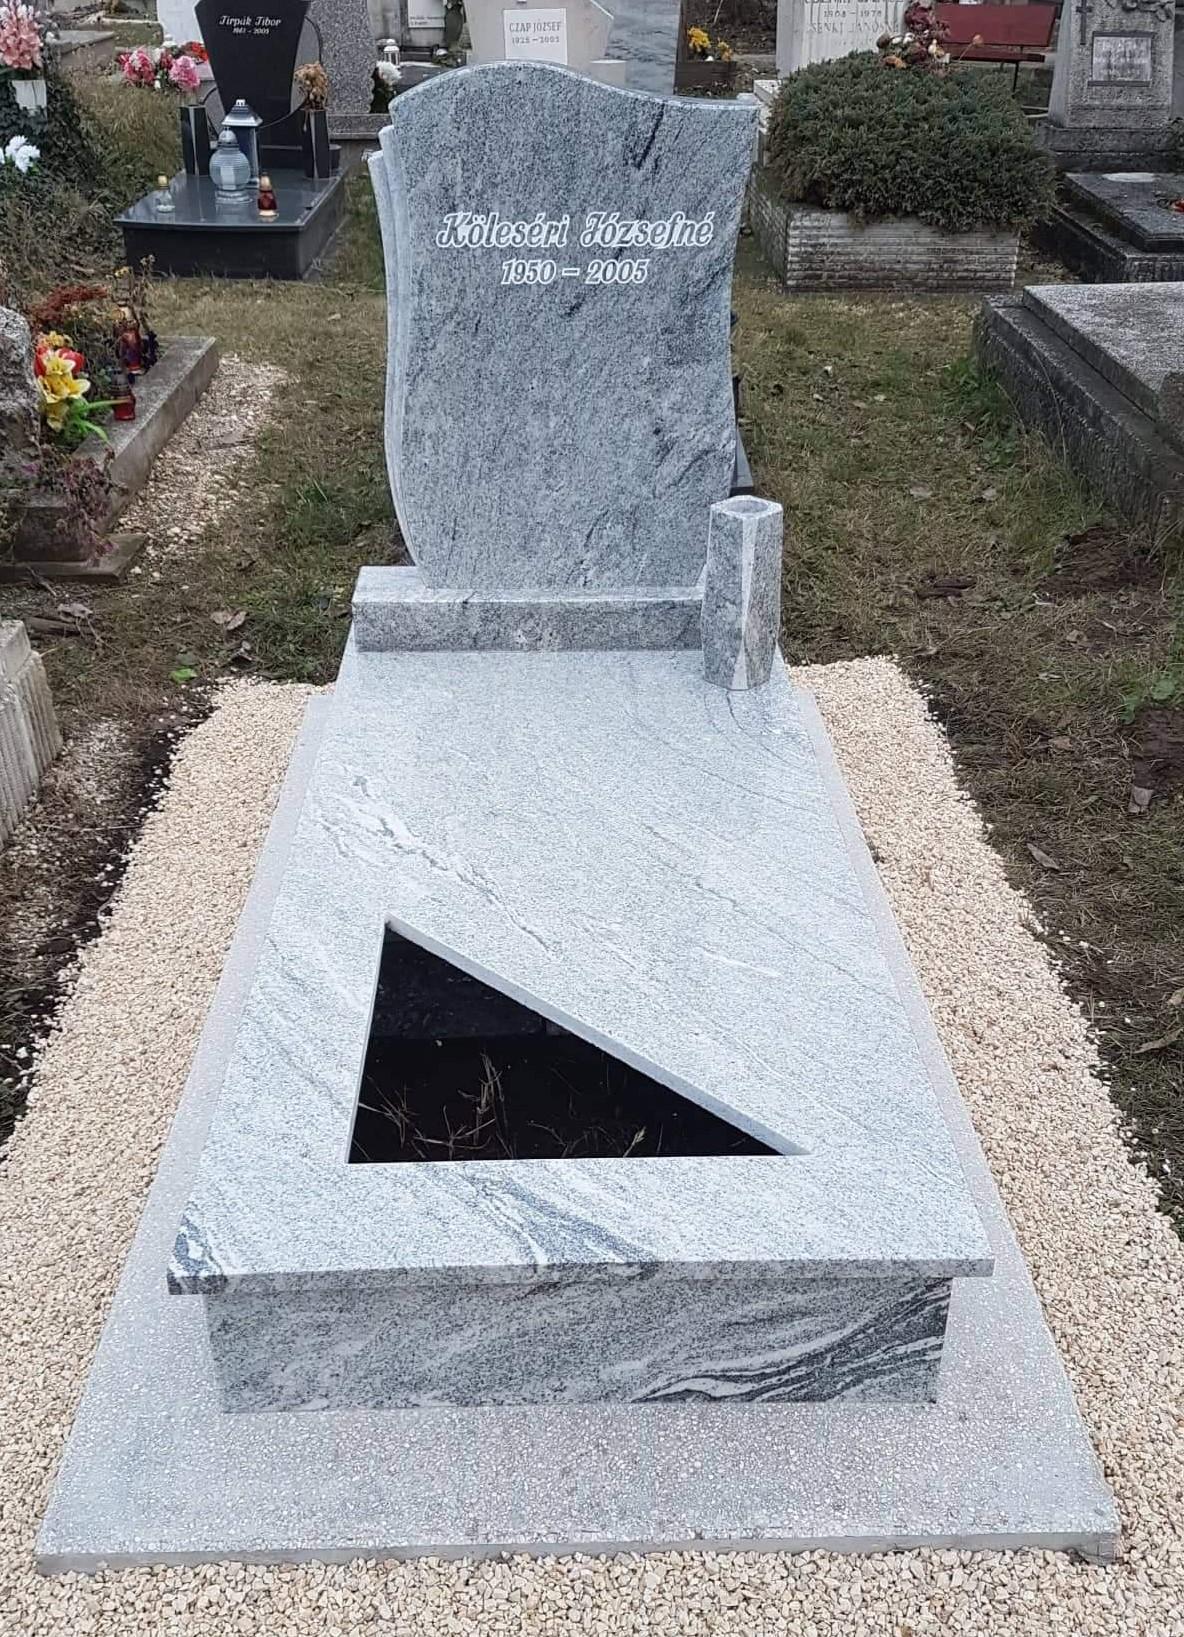 Viscount white szimpla gránit síremlék akciós ár 430.000 Ft